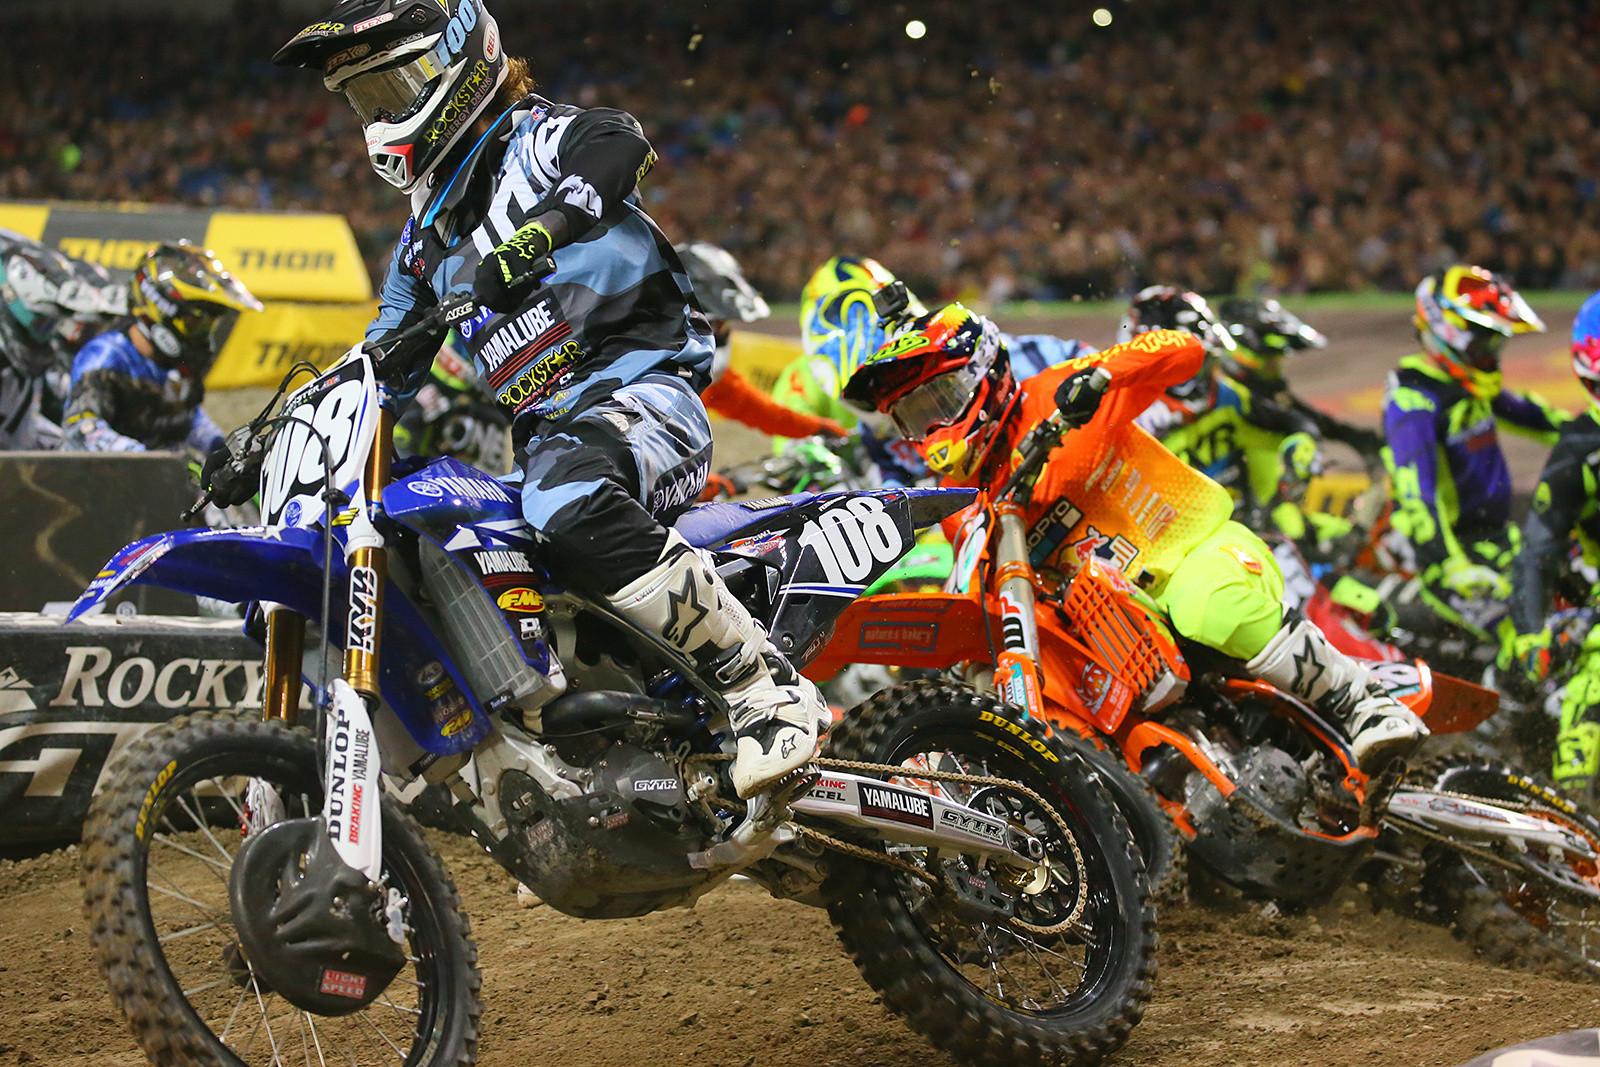 Photo Blast: Toronto, and 250 Heat Race One Start - Photo Blast: Toronto - Motocross Pictures - Vital MX